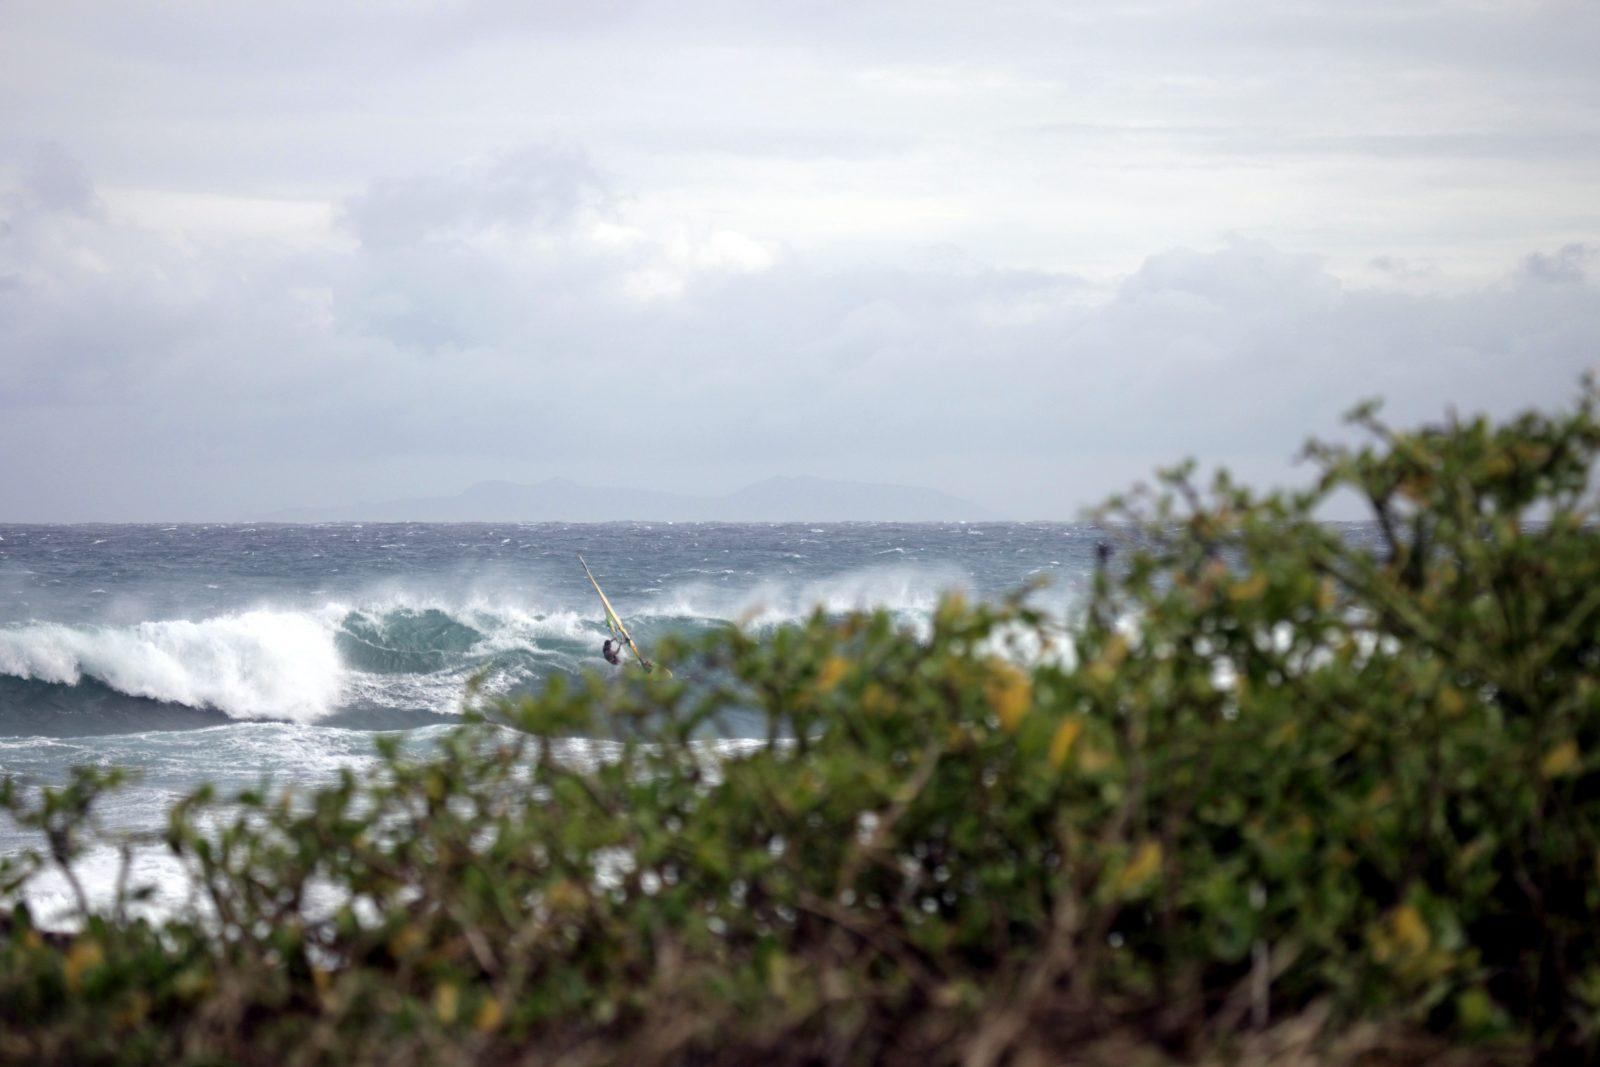 windsurfing-in-Taiwan-Taitung-Jinzun-Point-e1465092647915